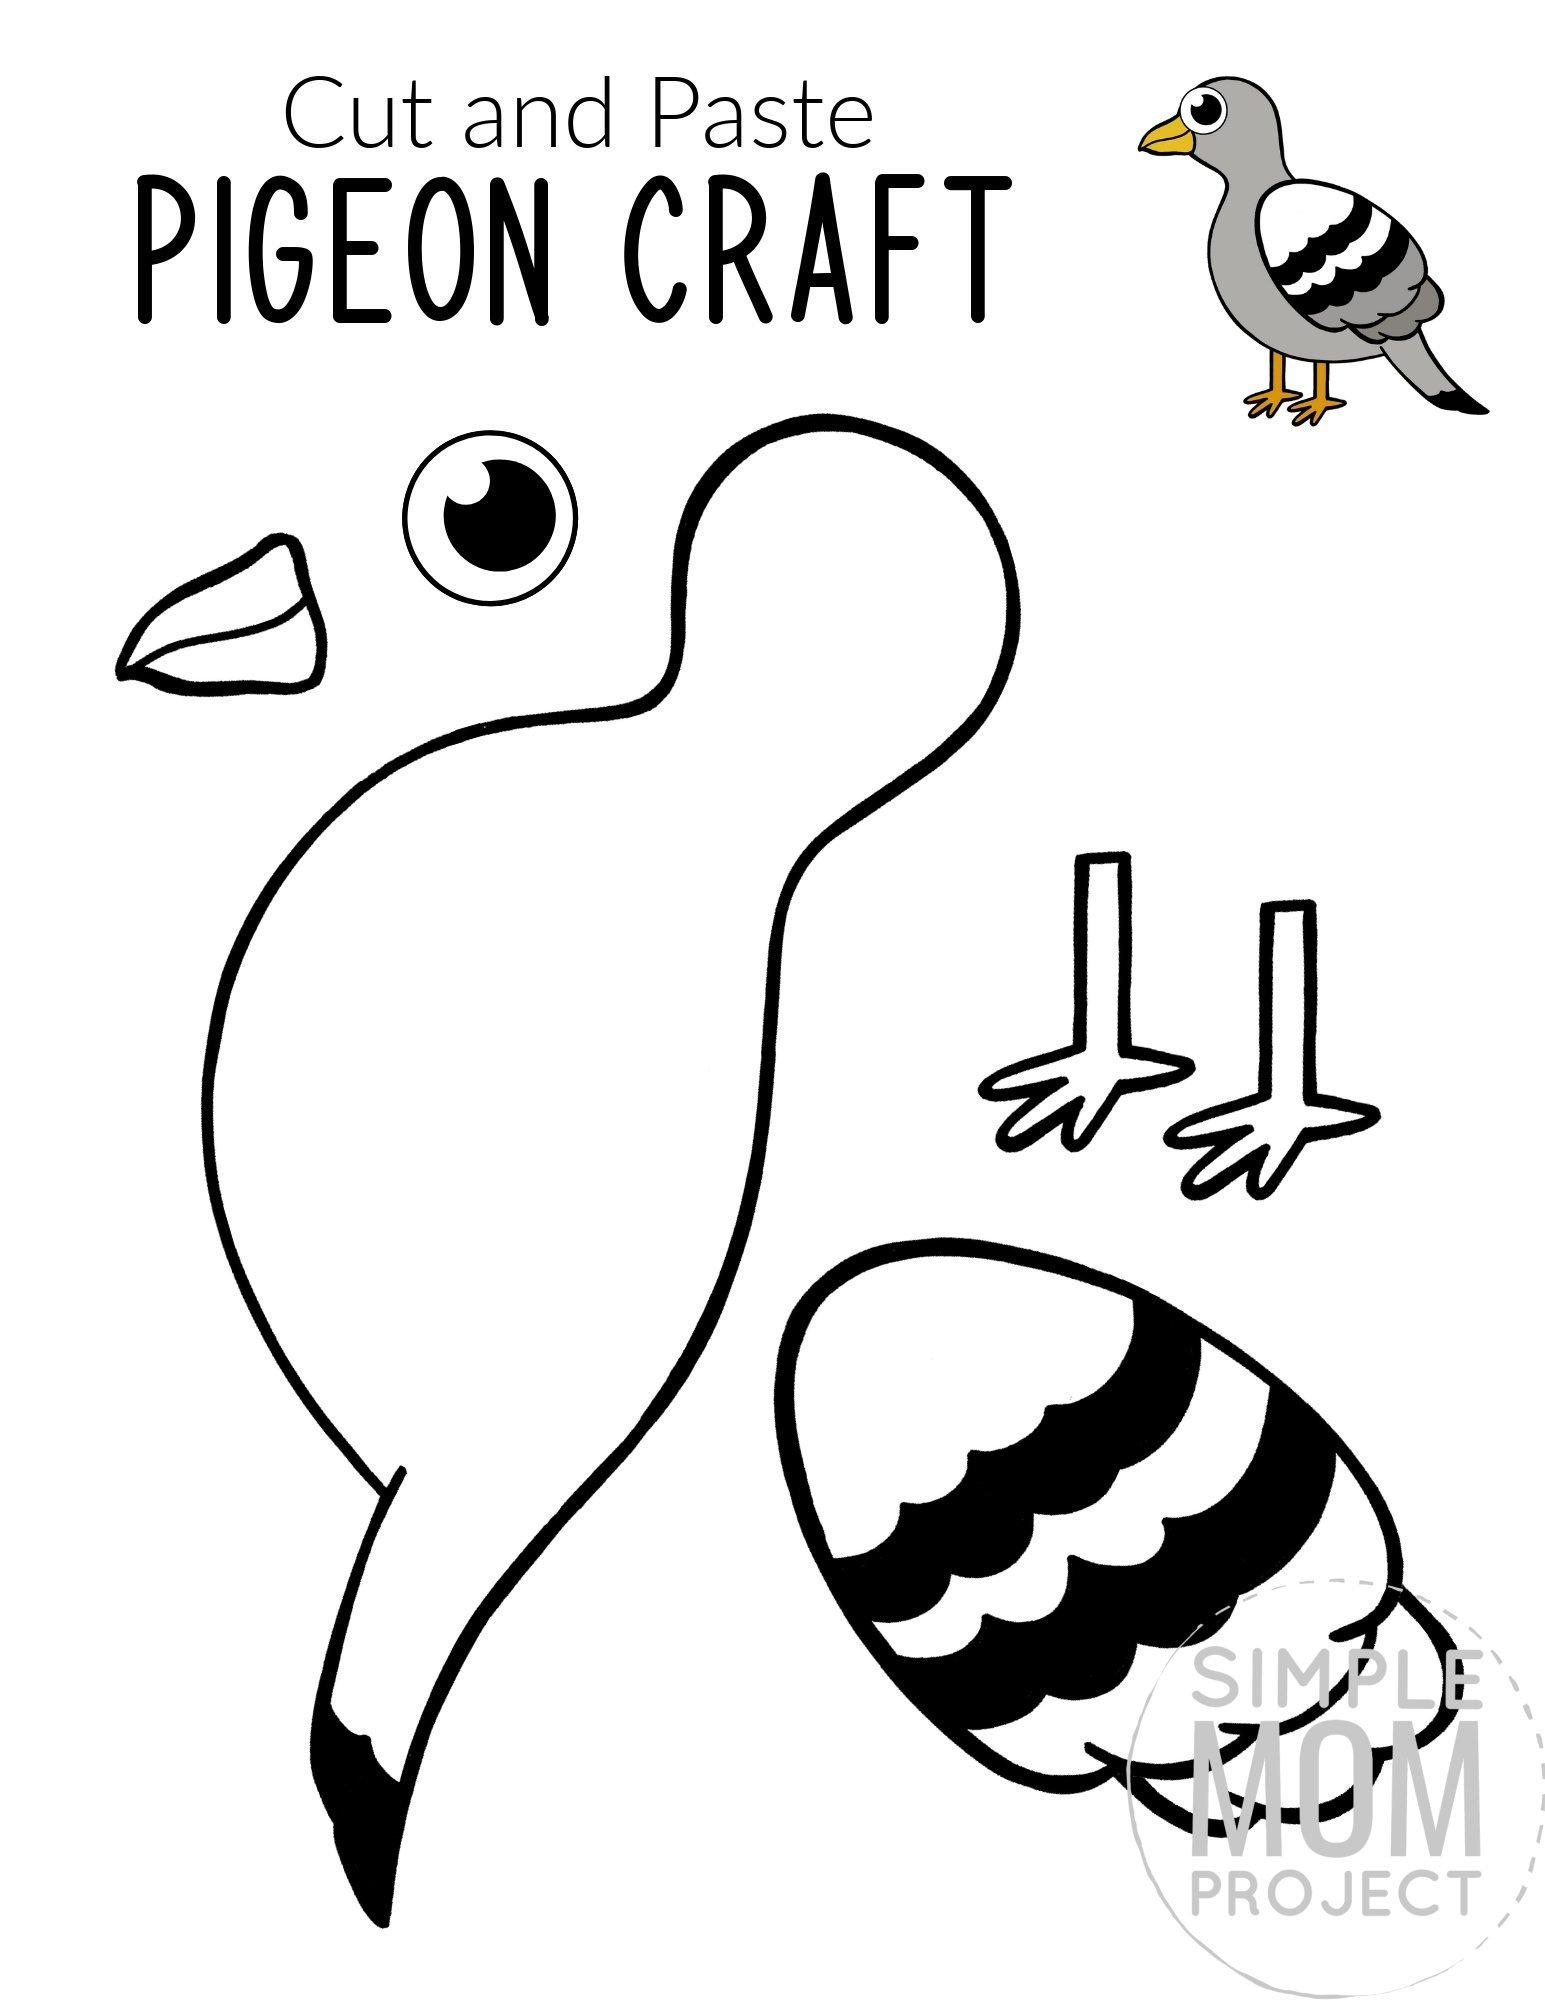 Free Printable Pigeon Craft for Kids, preschoolers toddlers and kindergartners